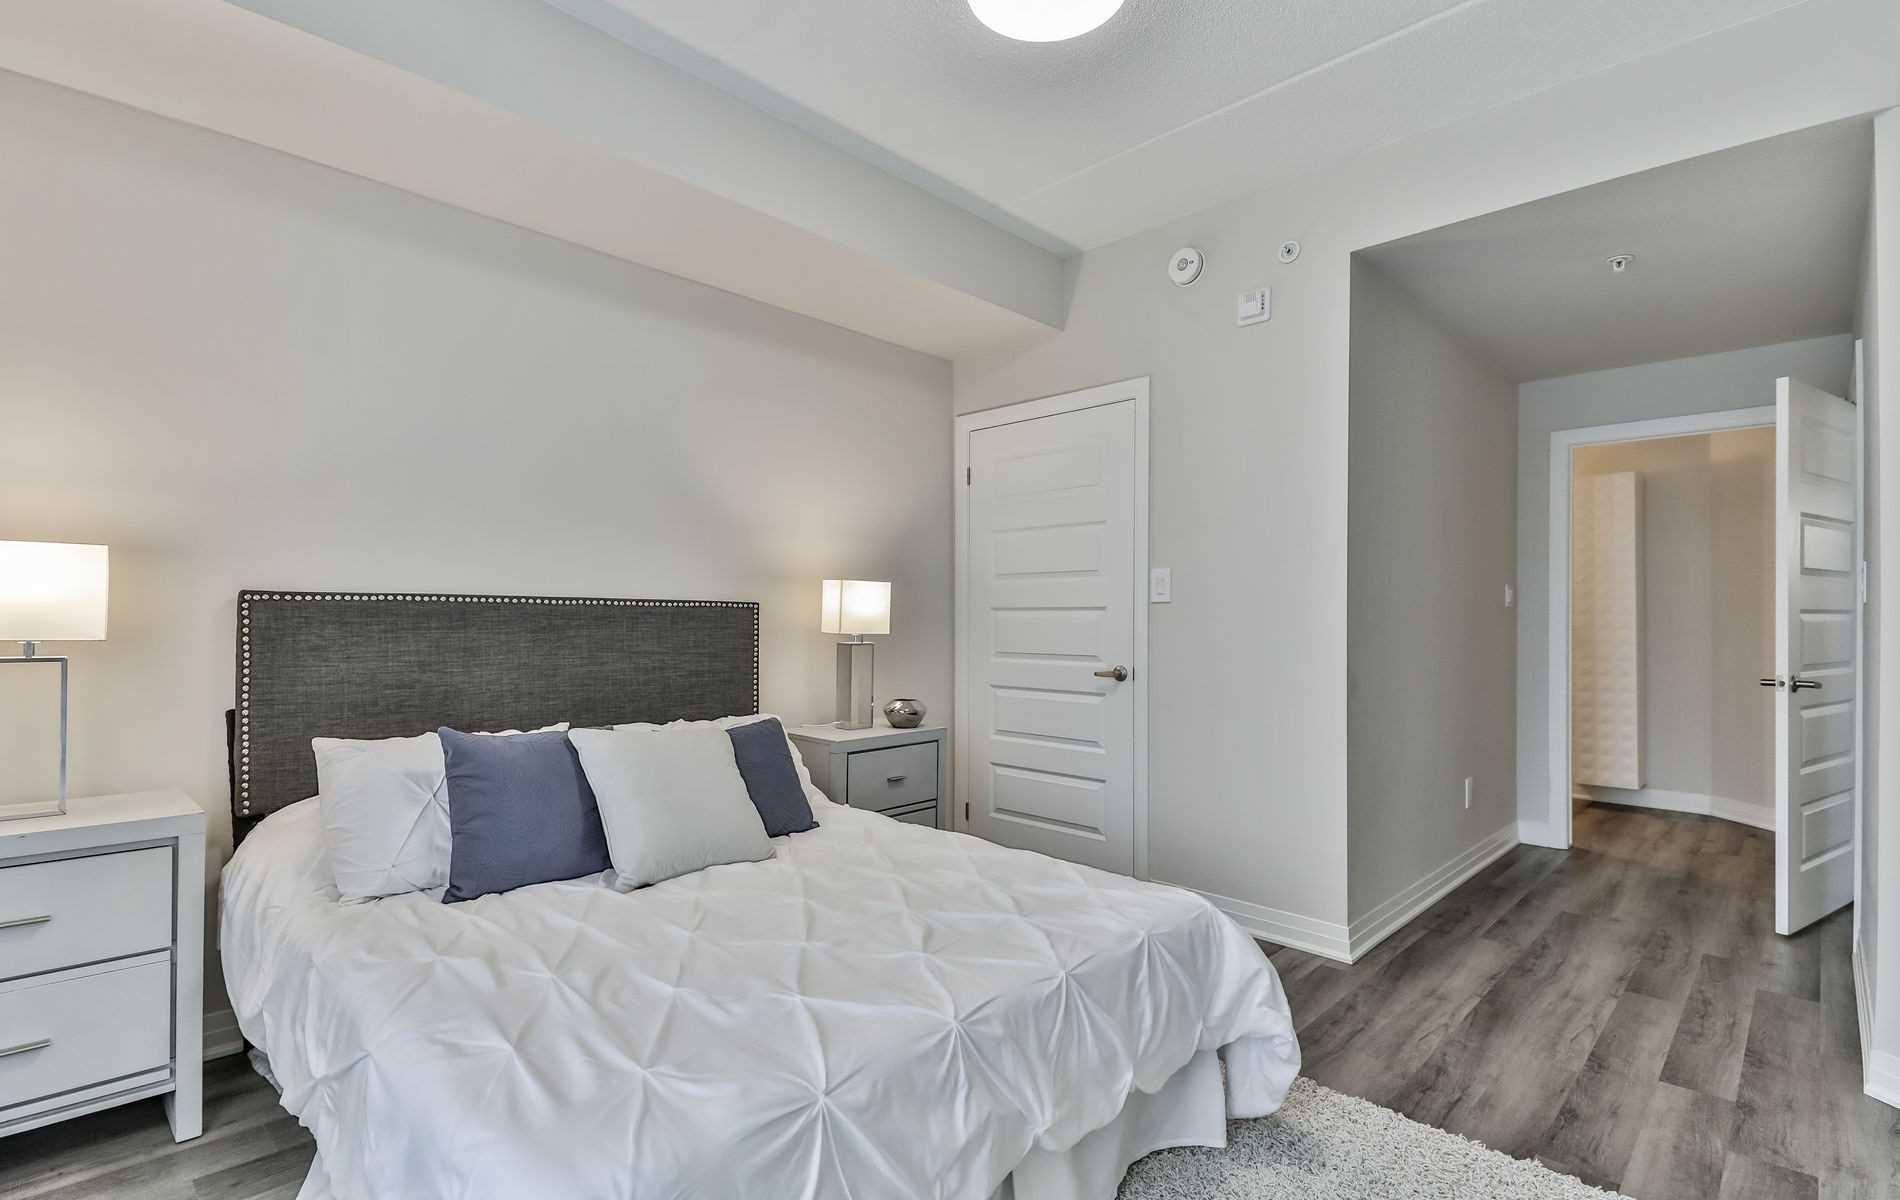 316 - 610 Farmstead Dr - Willmont Condo Apt for sale, 2 Bedrooms (W5399854) - #15